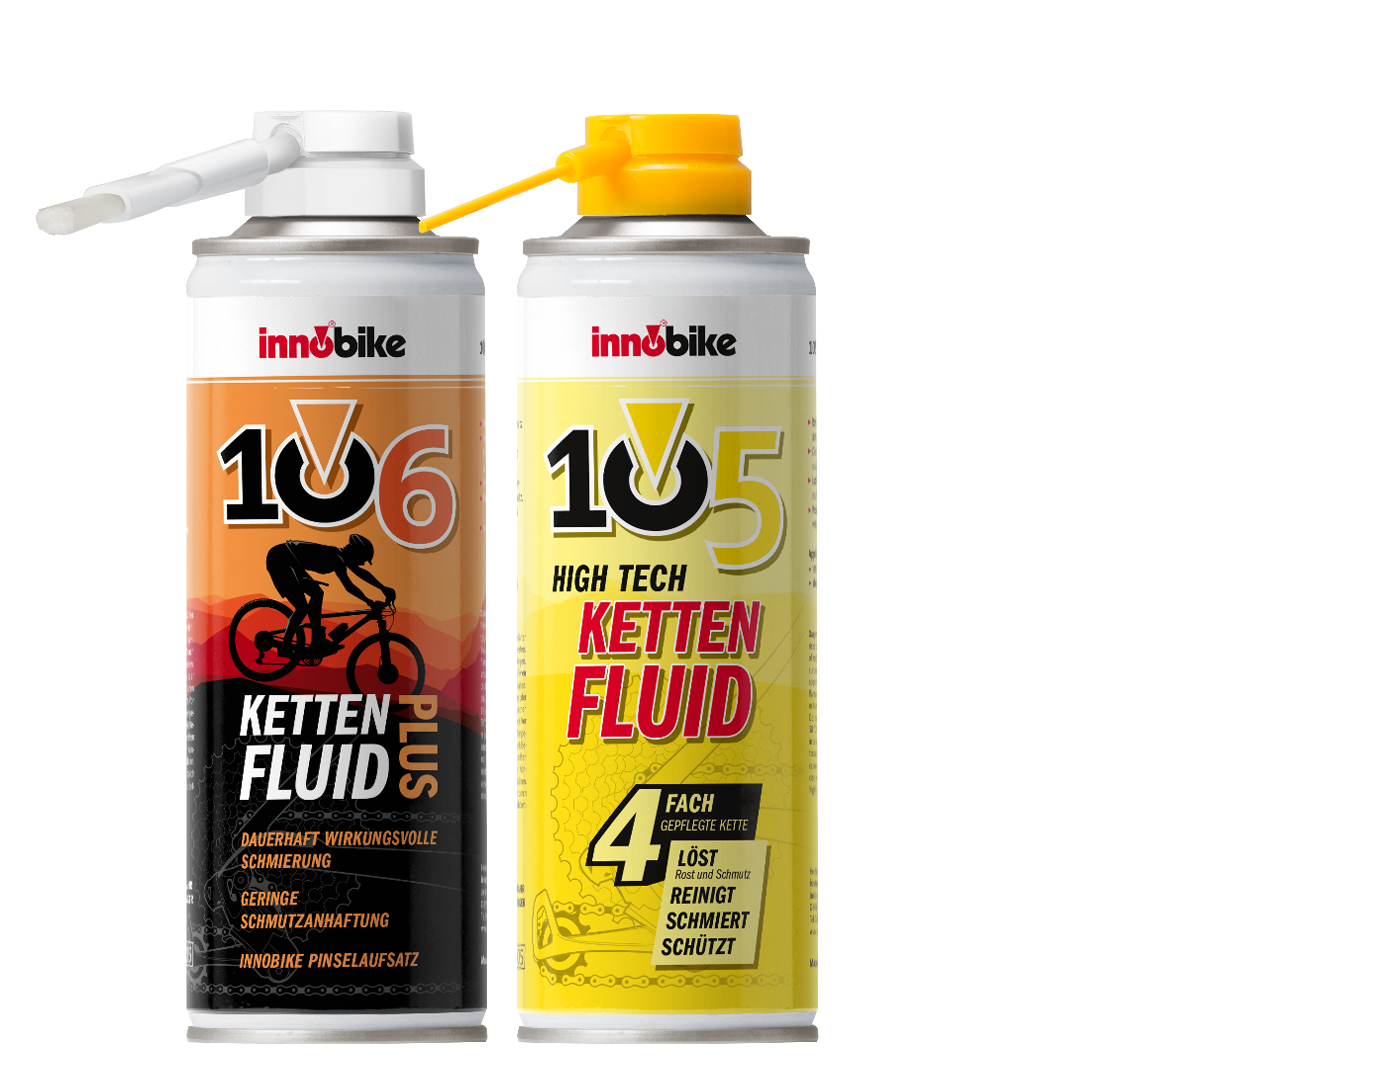 innobike Fluid Bundle